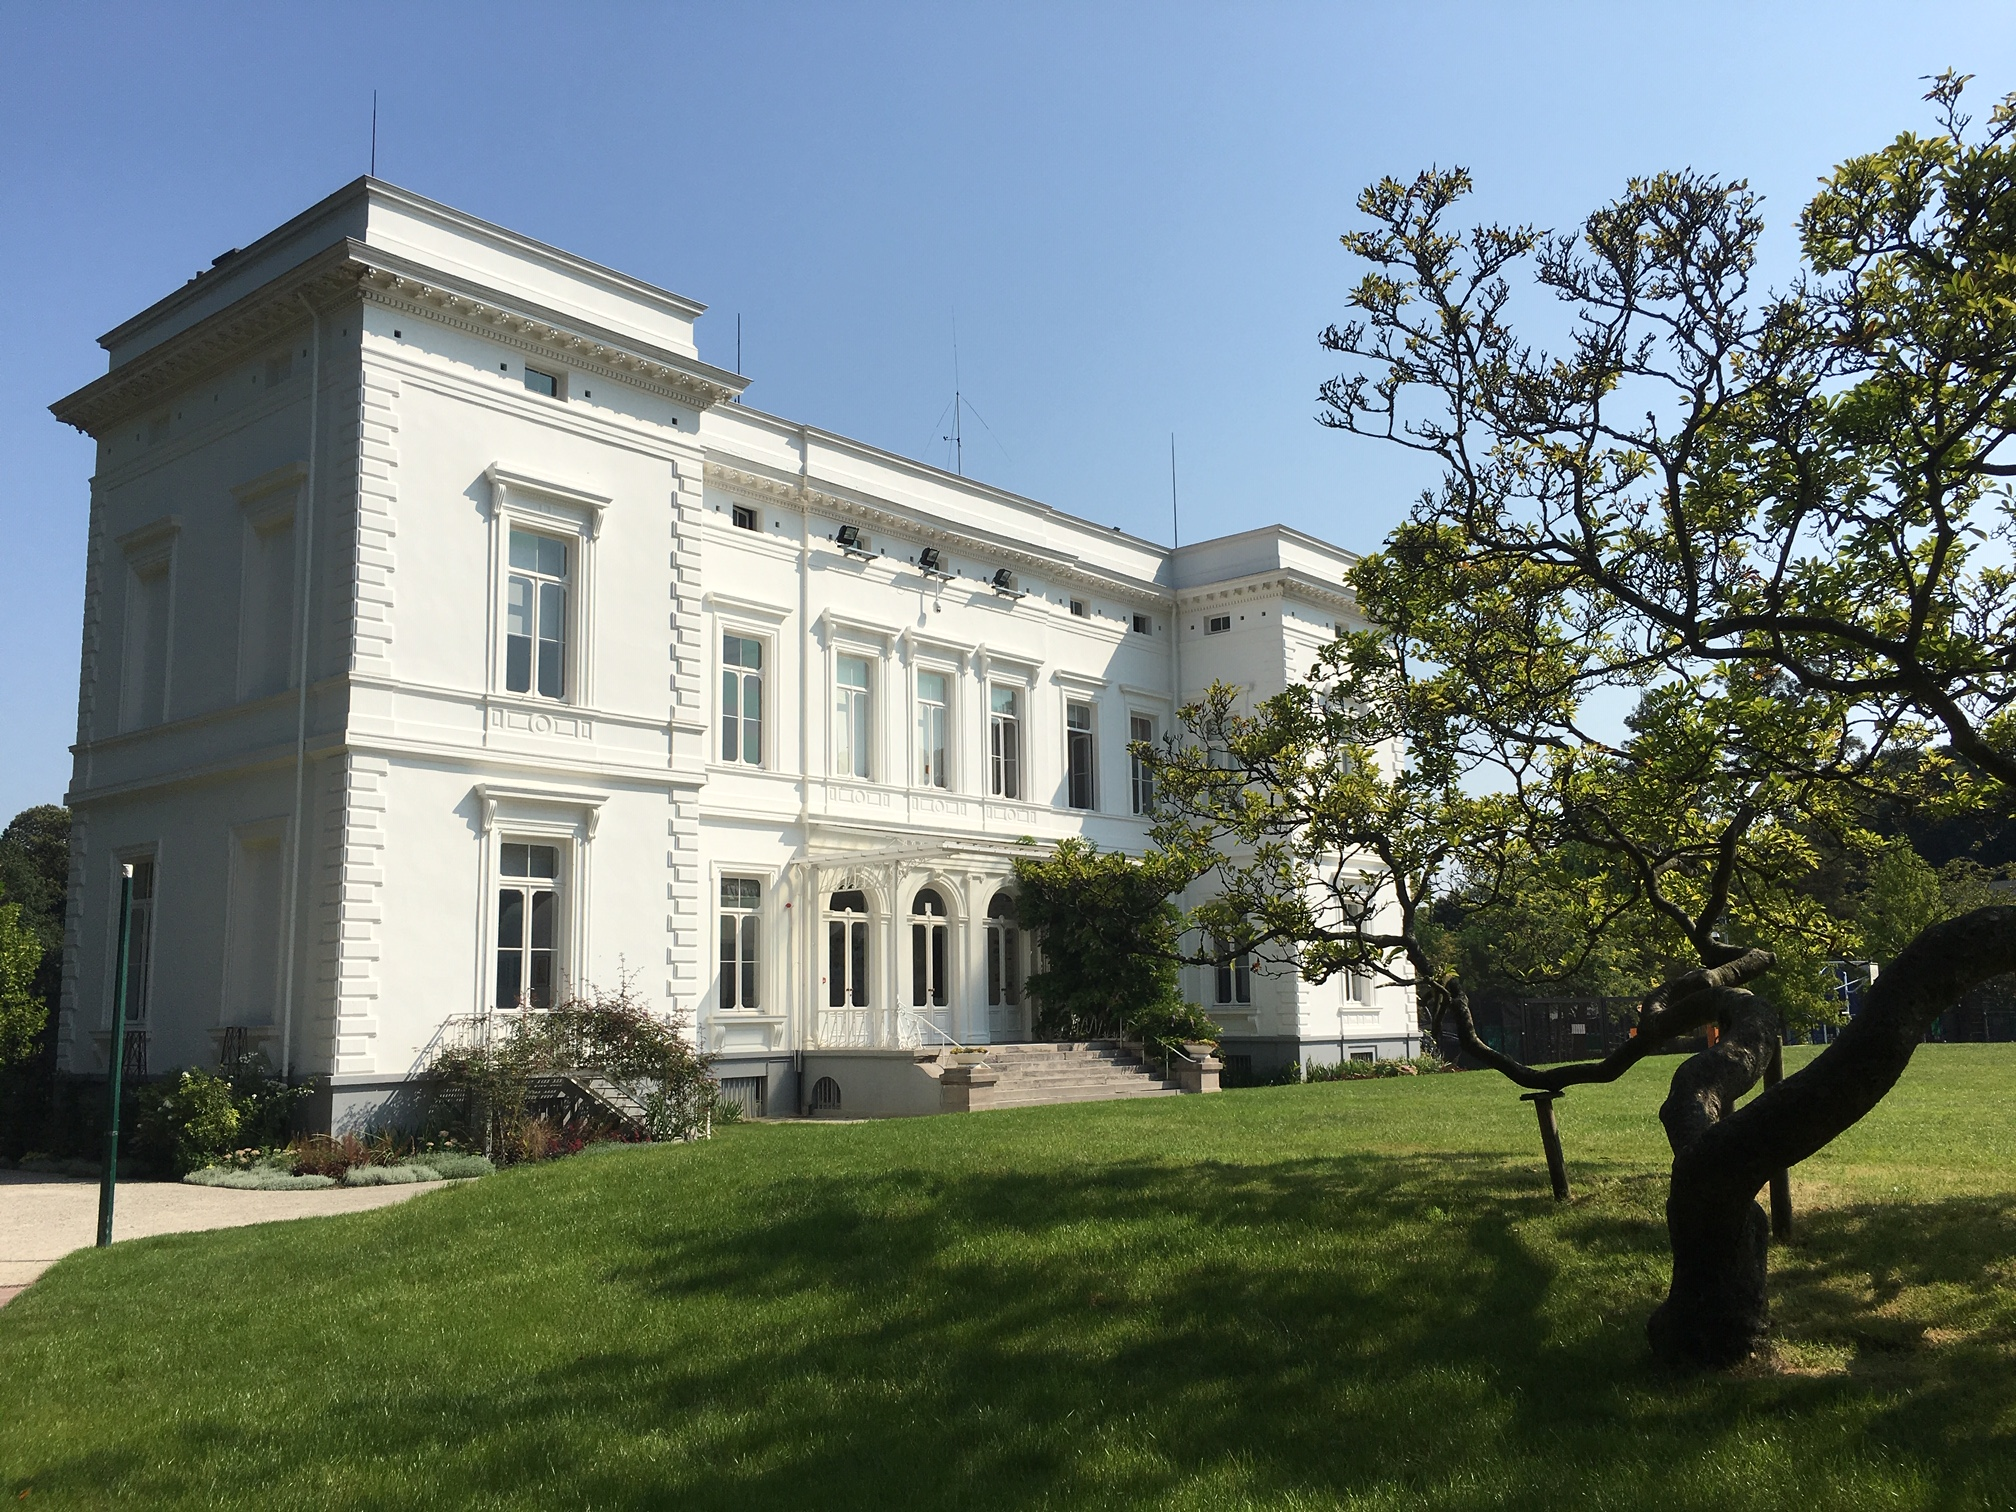 International School of Brussels (I.S.B.)